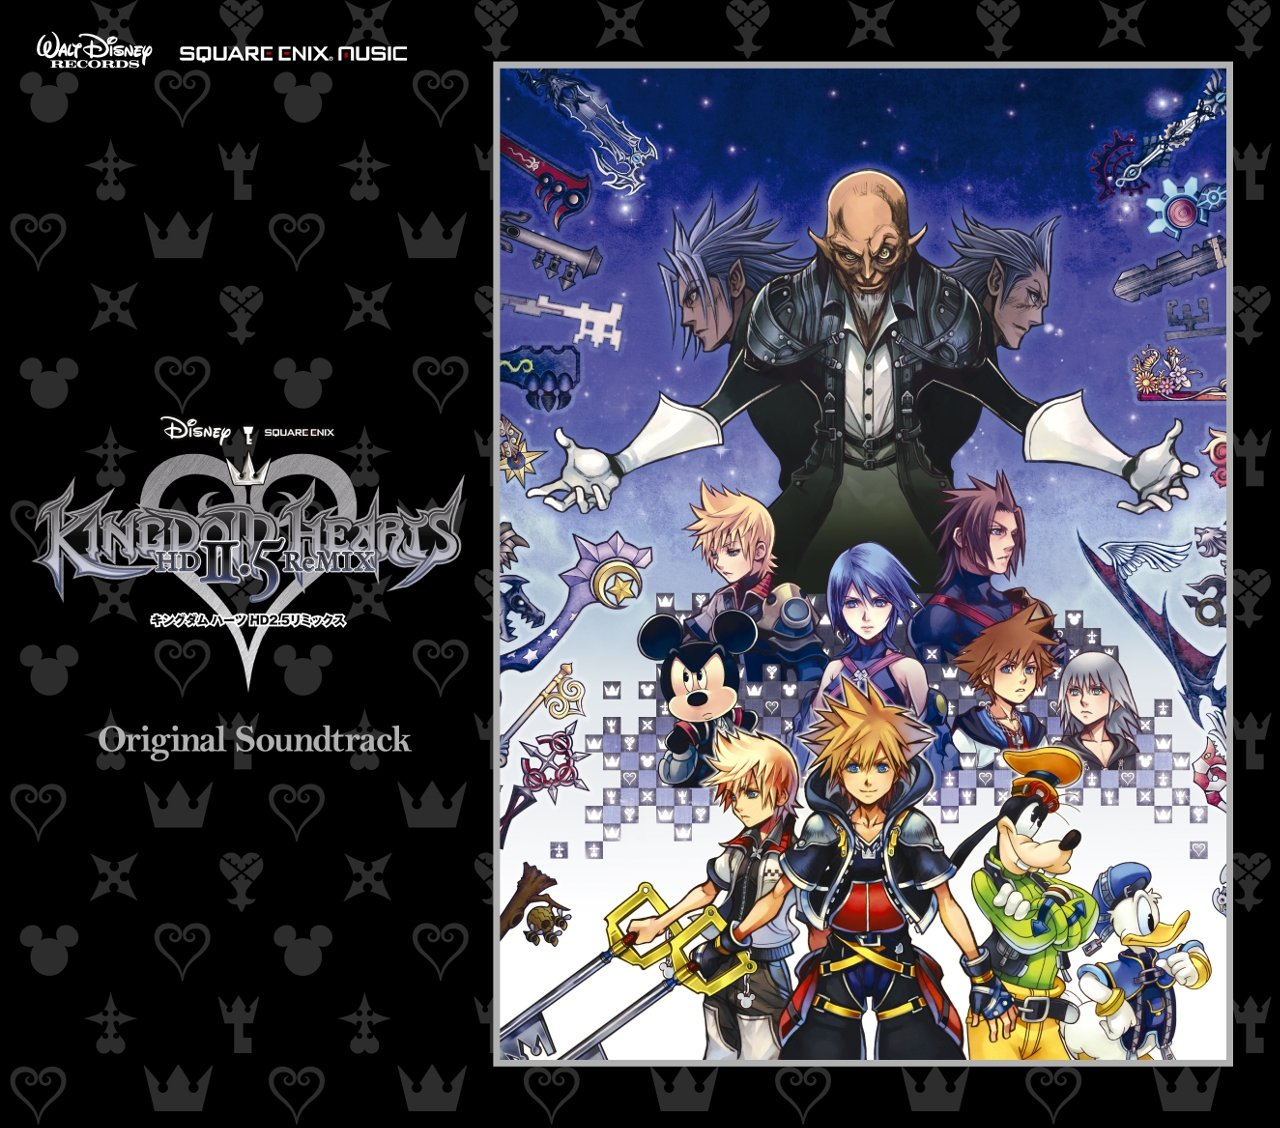 KINGDOM HEARTS HD 2 5 ReMIX Original Soundtrack [CD] | Square Enix Store